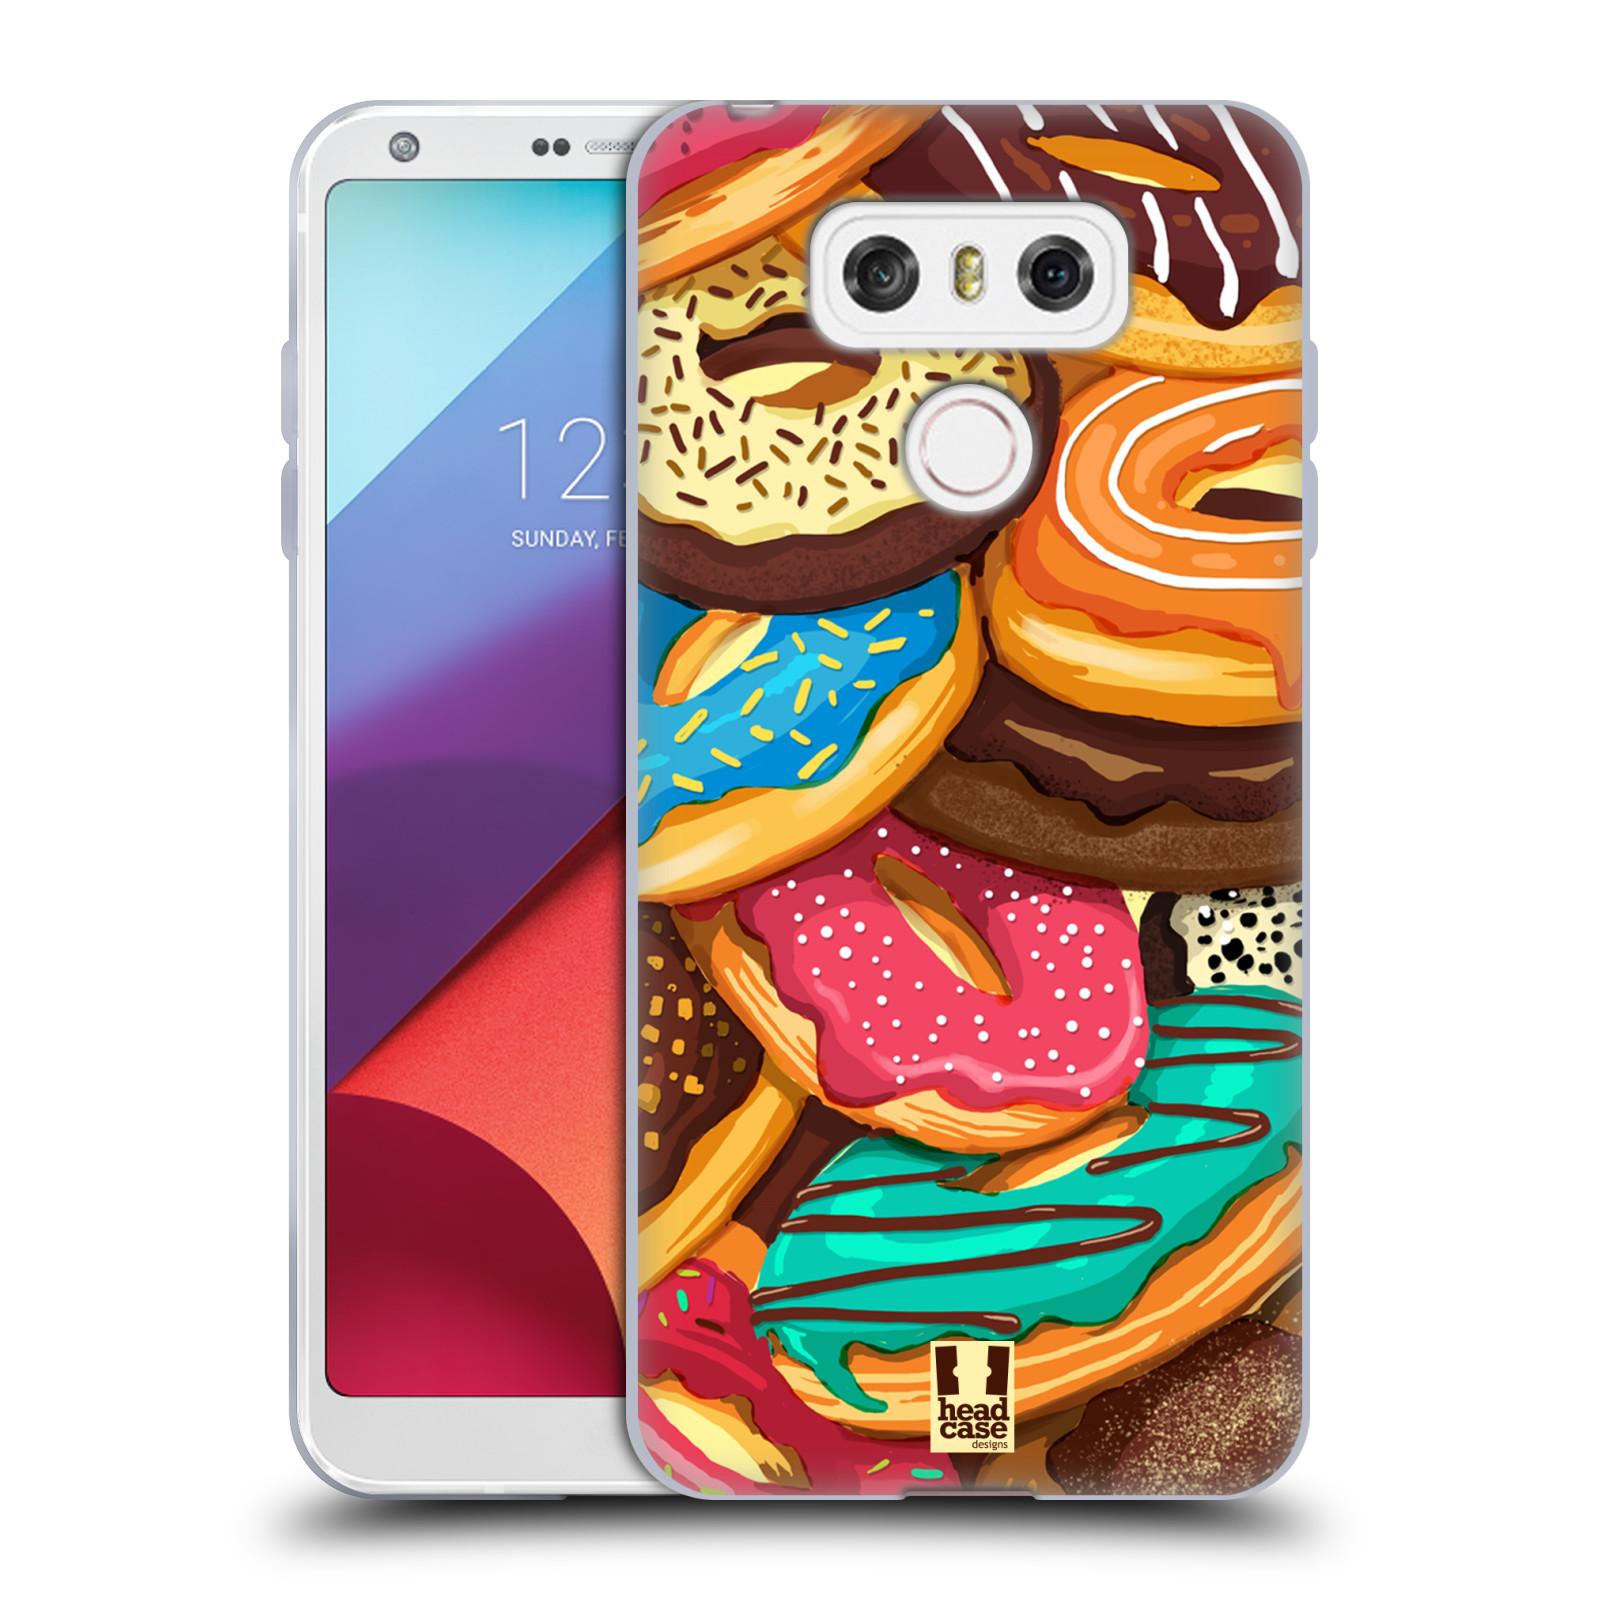 Silikonové pouzdro na mobil LG G6 - Head Case DONUTKY VŠUDE (Silikonový kryt či obal na mobilní telefon LG G6 H870 / LG G6 Dual SIM H870DS)